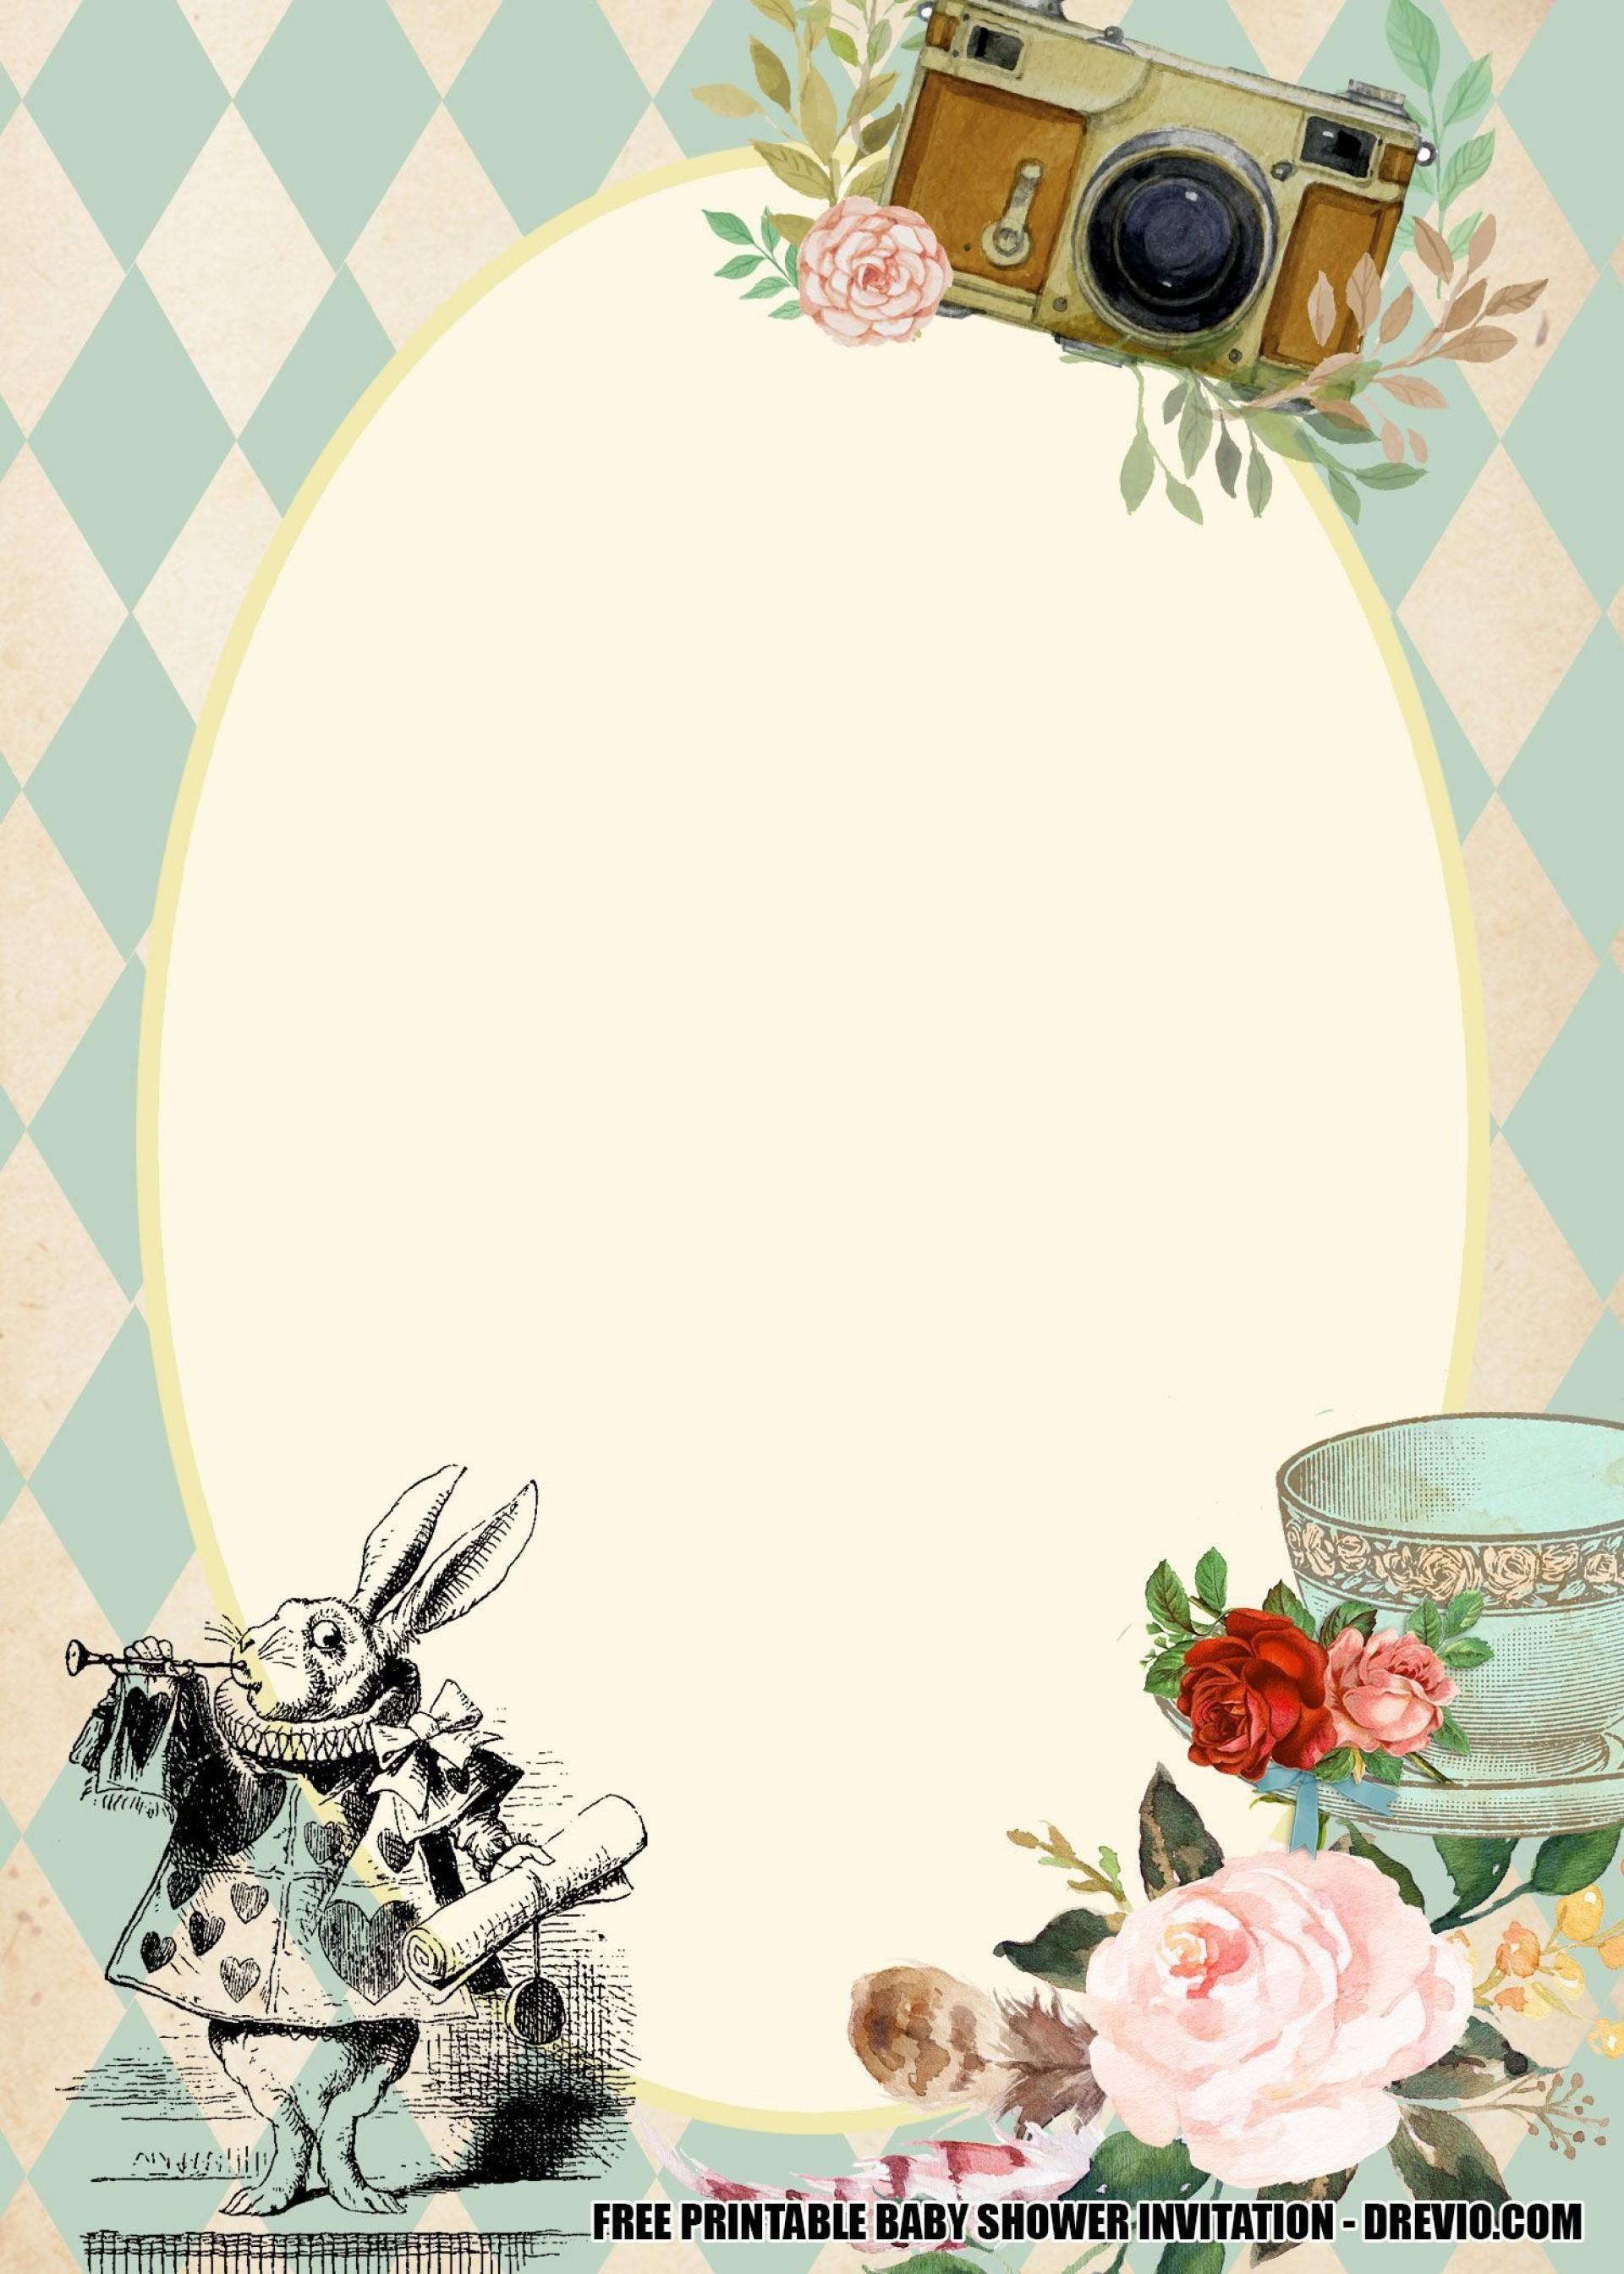 003 Wondrou Alice In Wonderland Invitation Template Download Photo  Free1920